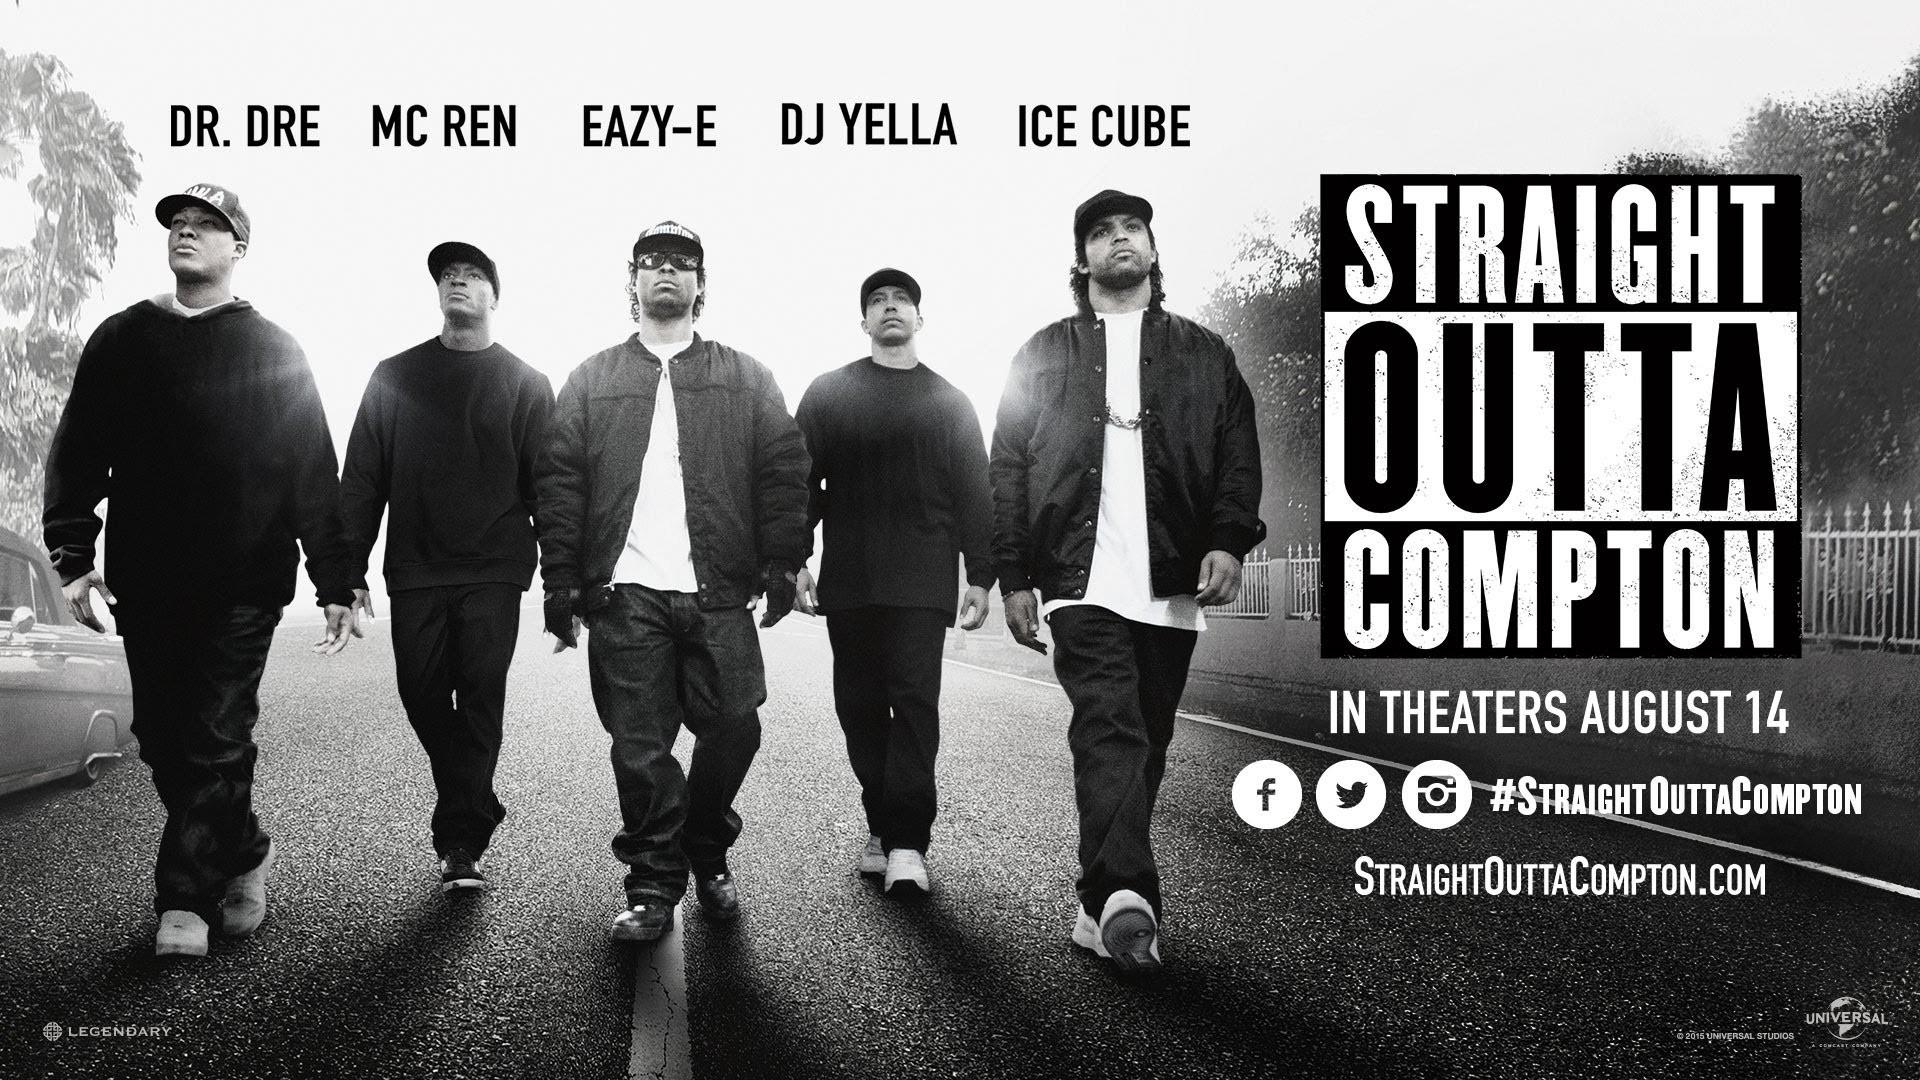 Голос Улиц Straight Outta Compton Soundtrack N.W.A. – 8 Ball